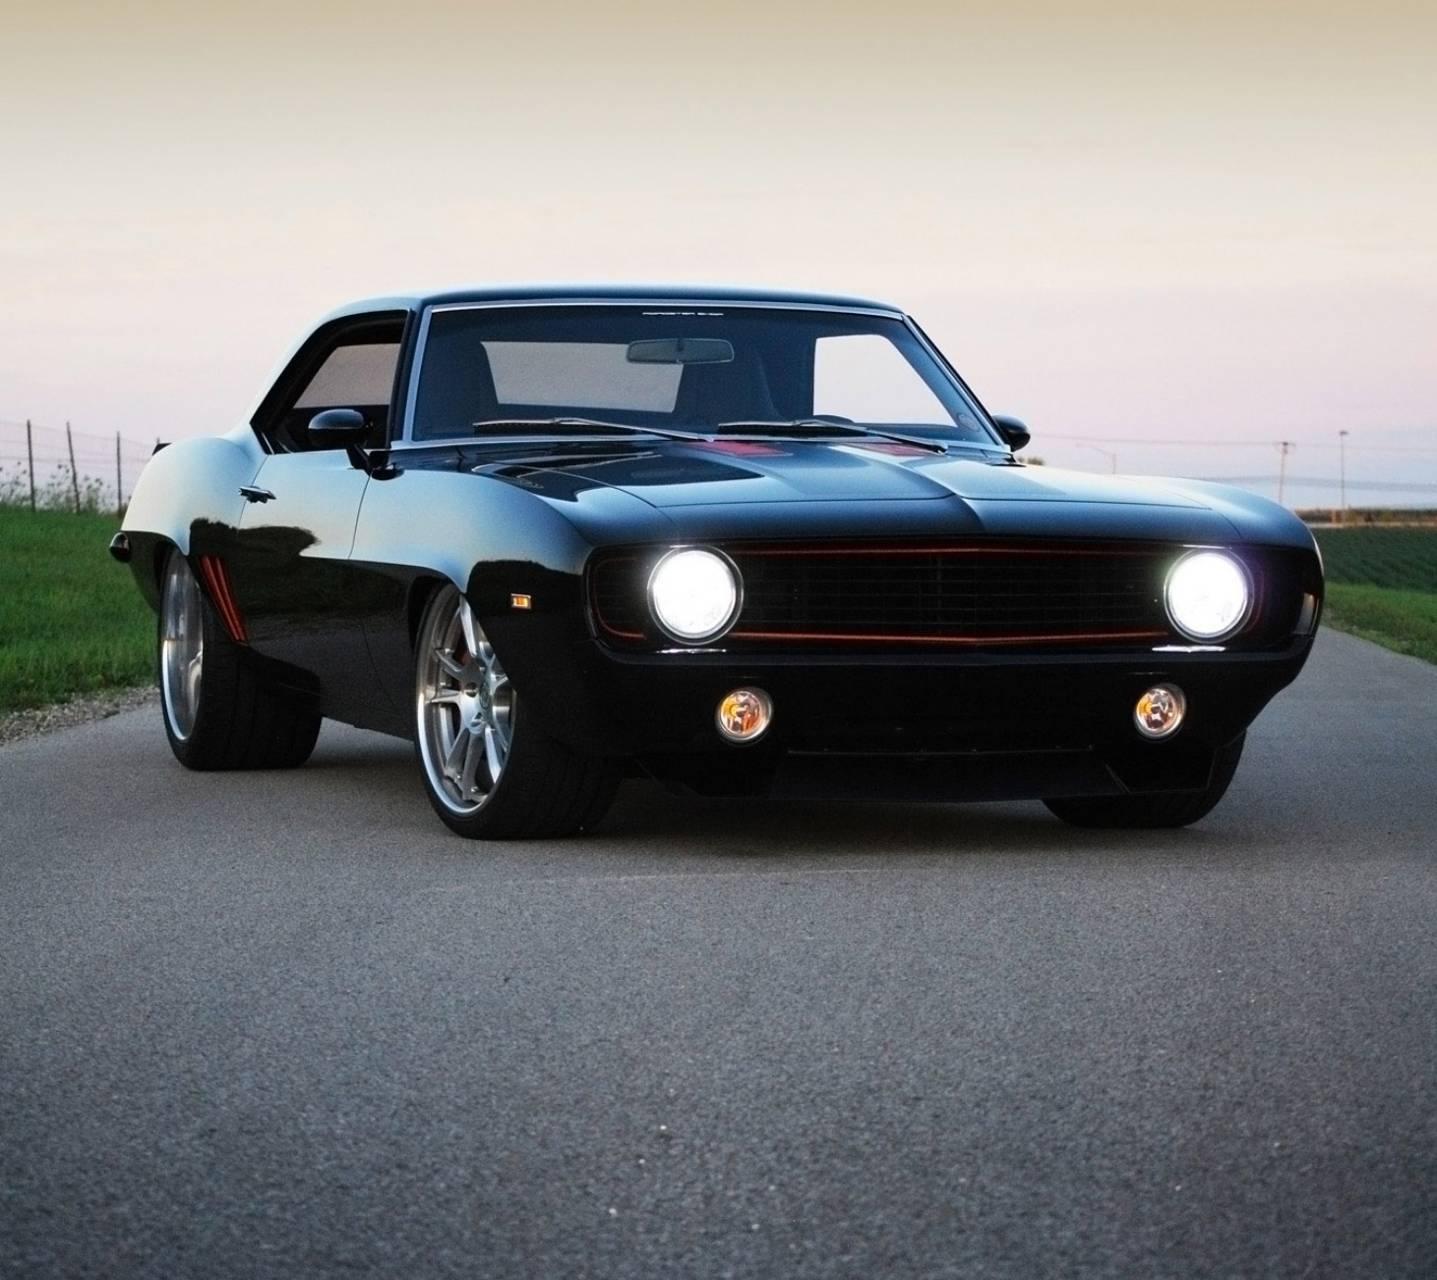 Tuned Chevy Camaro